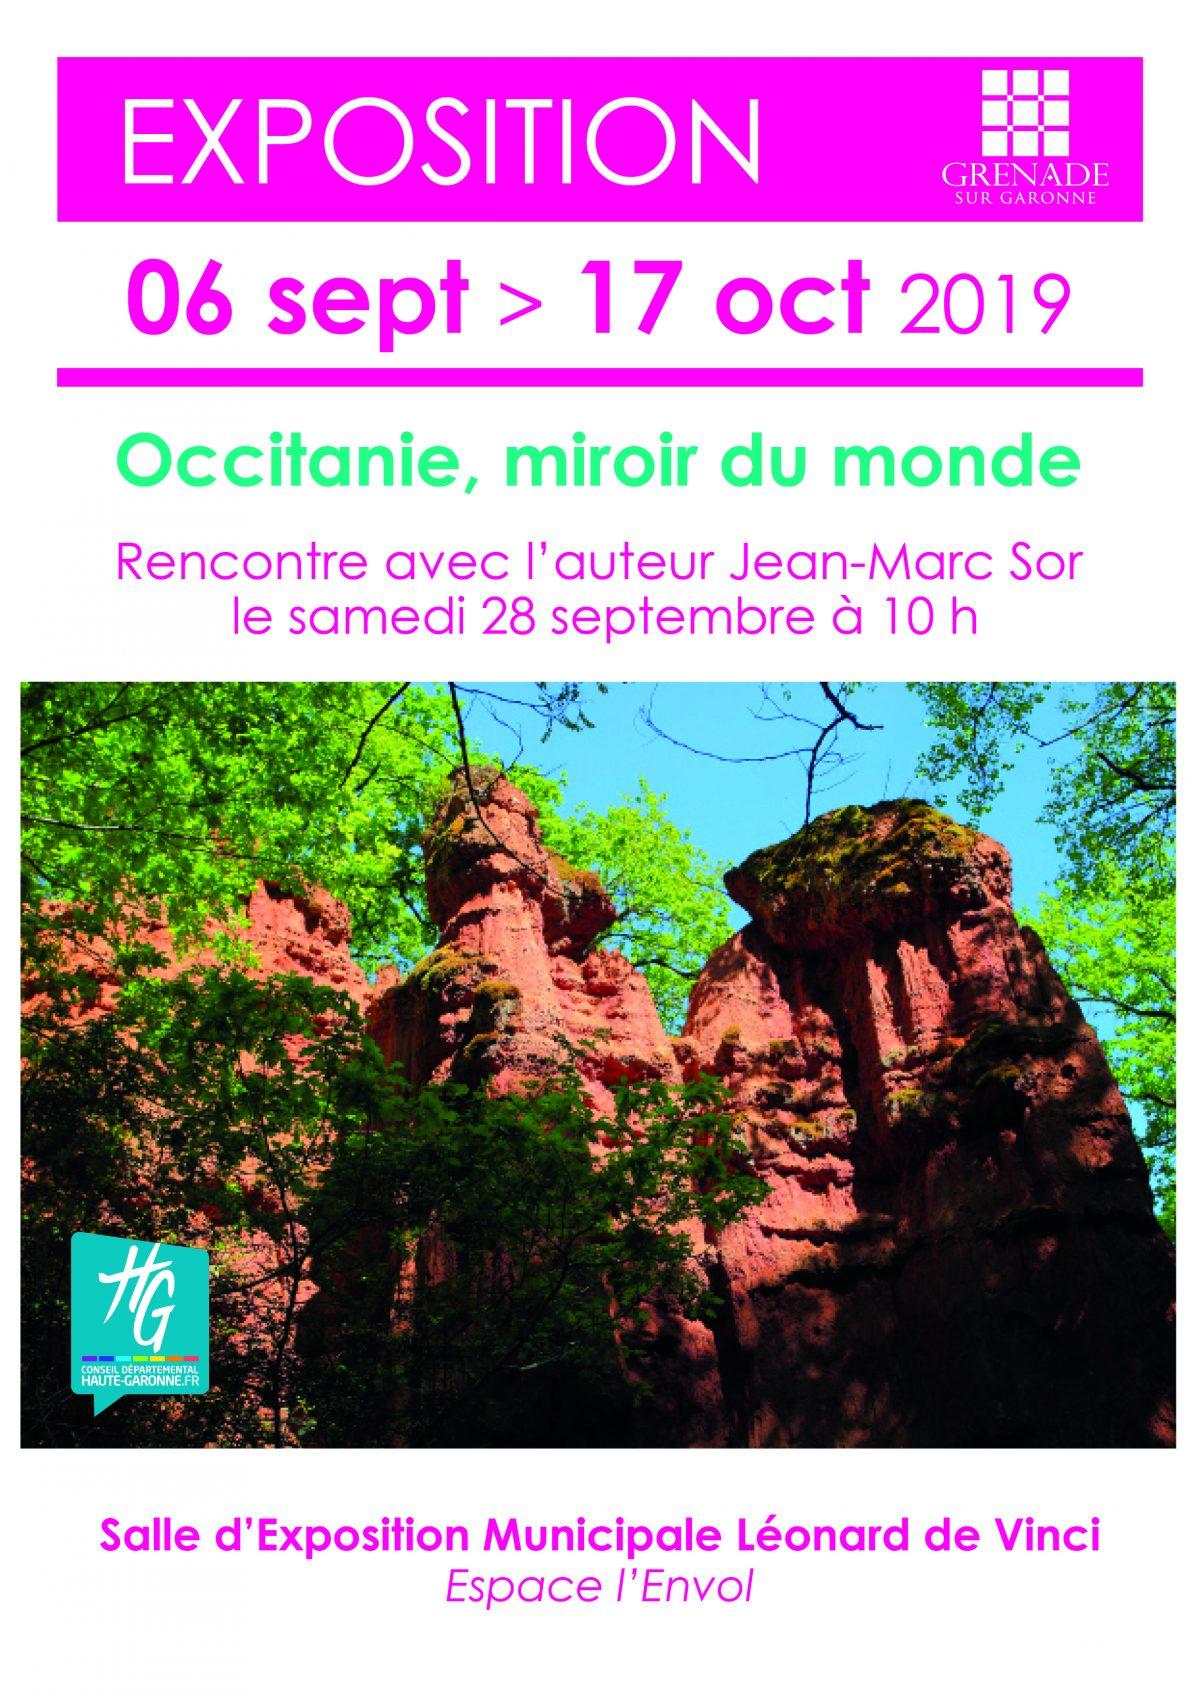 Exposition Occitanie, miroir du monde